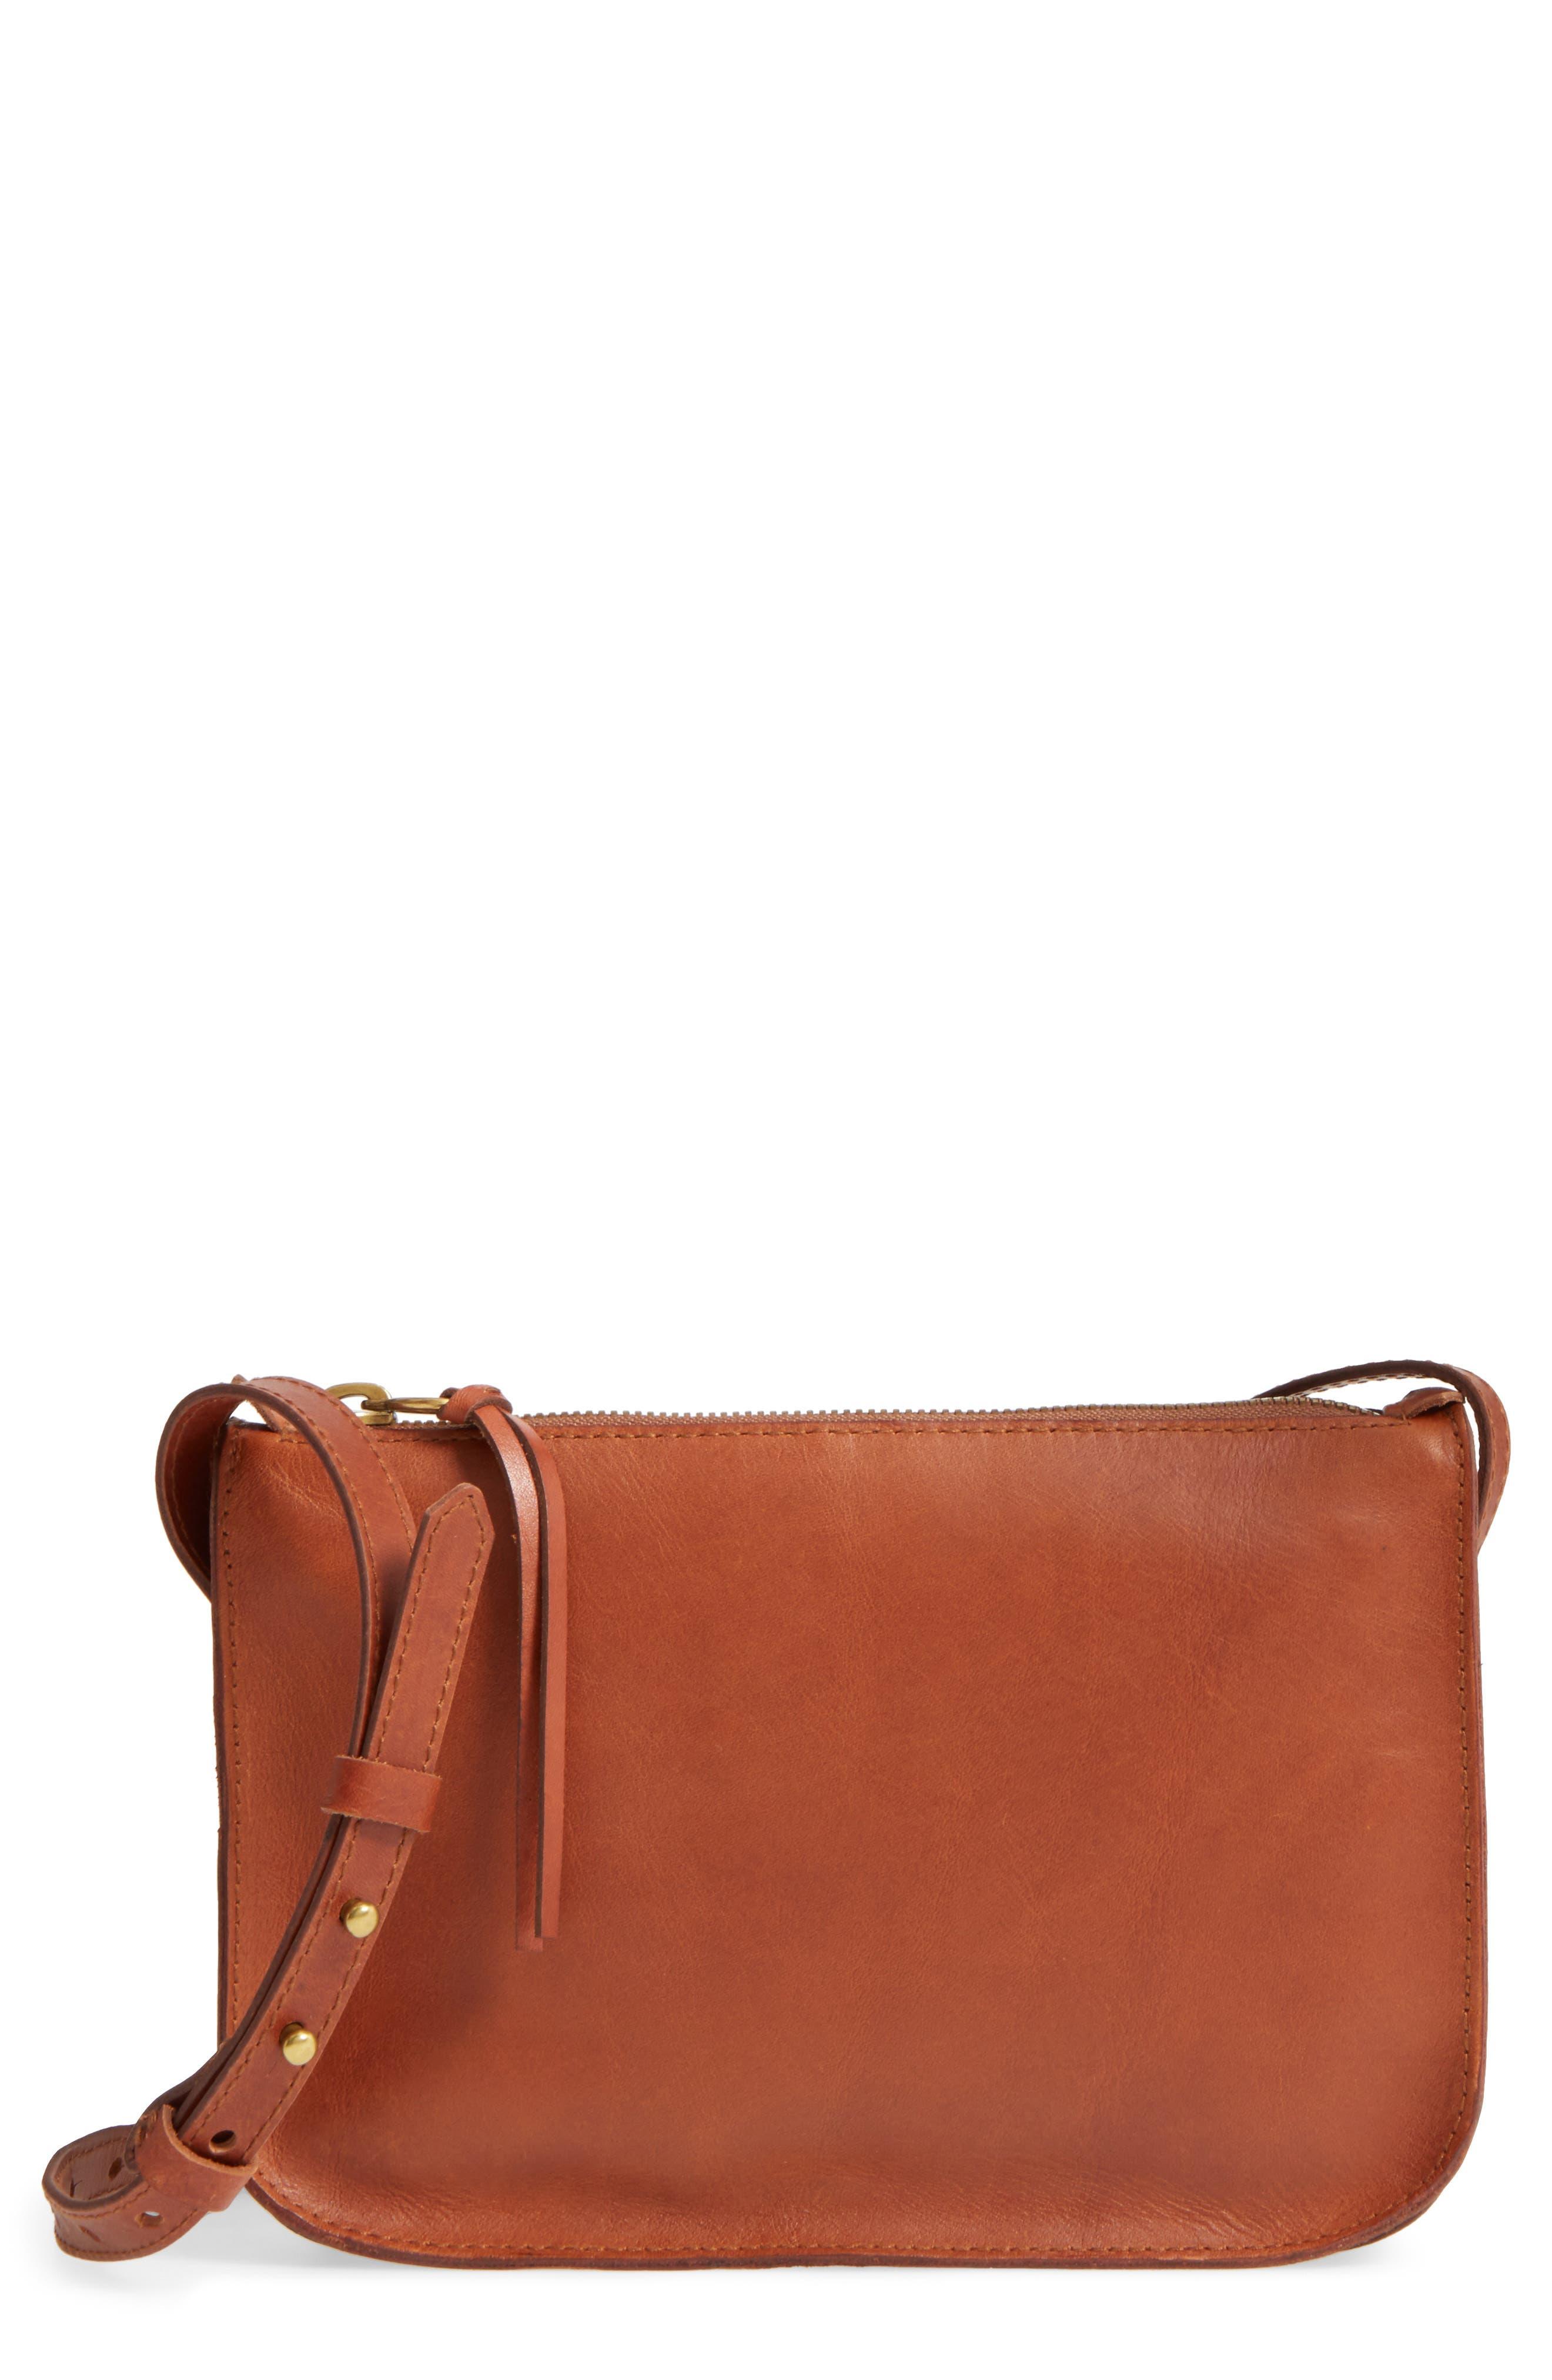 The Simple Leather Crossbody Bag,                             Main thumbnail 1, color,                             ENGLISH SADDLE